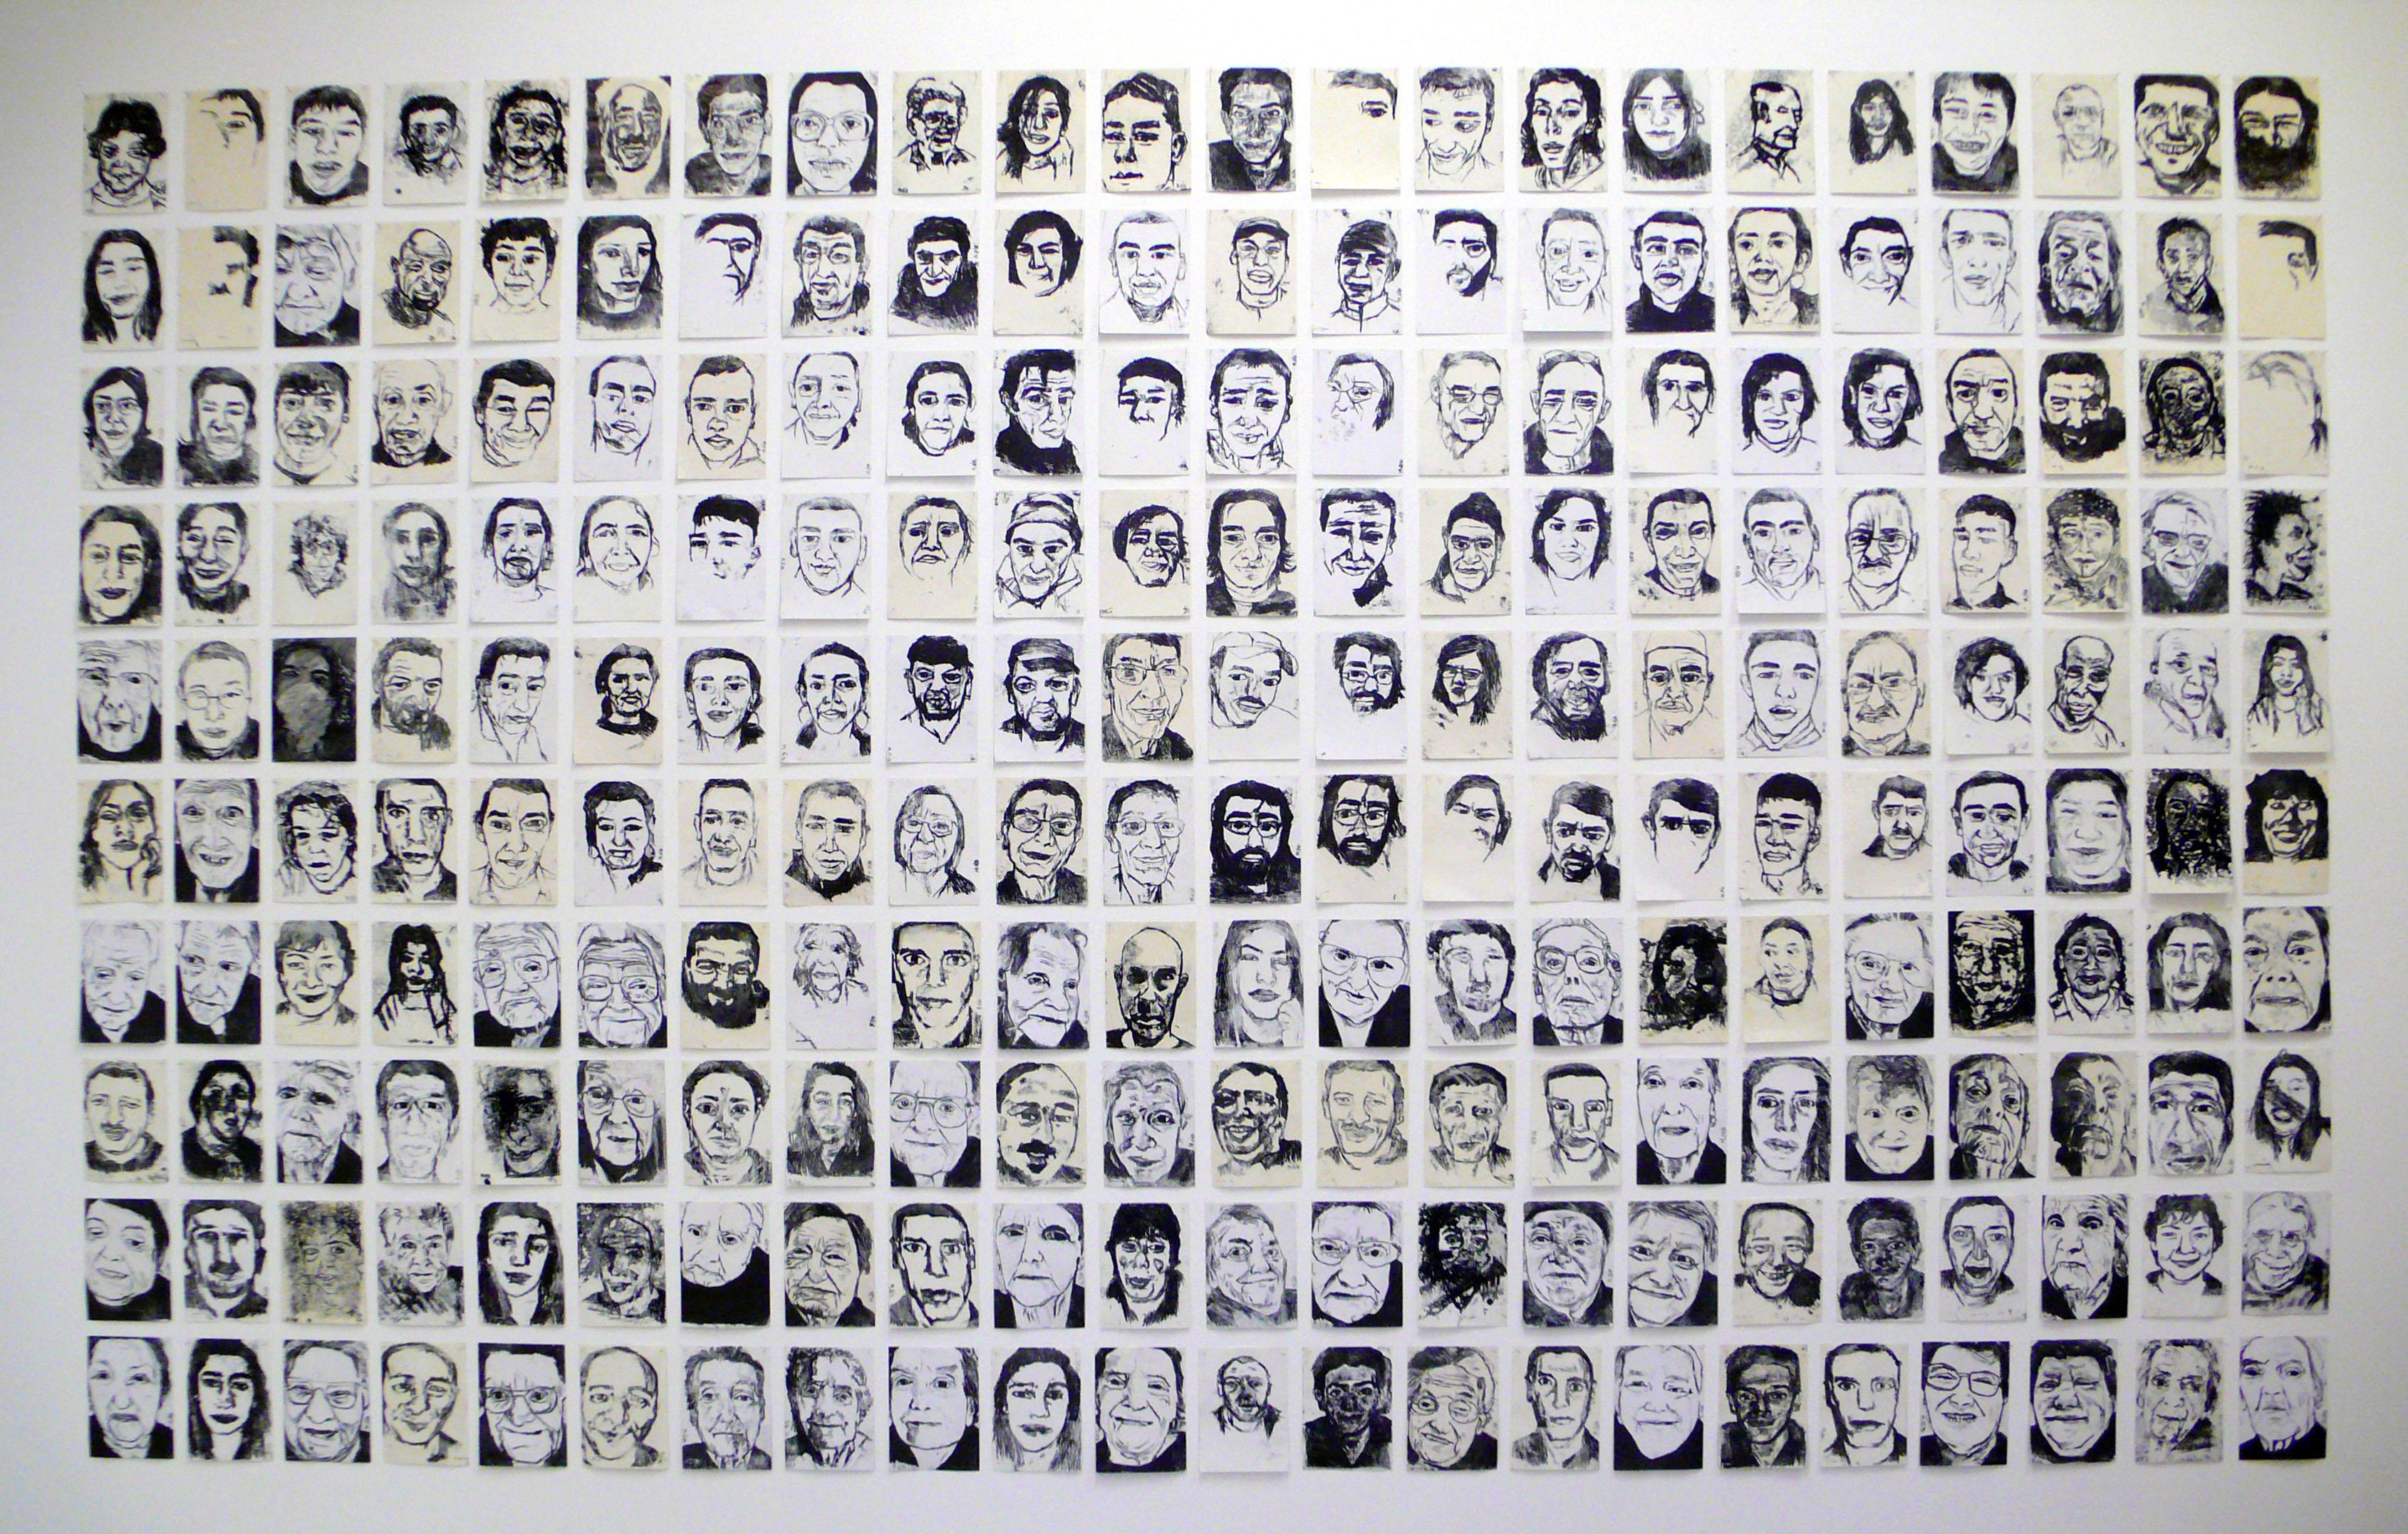 visages2.jpg